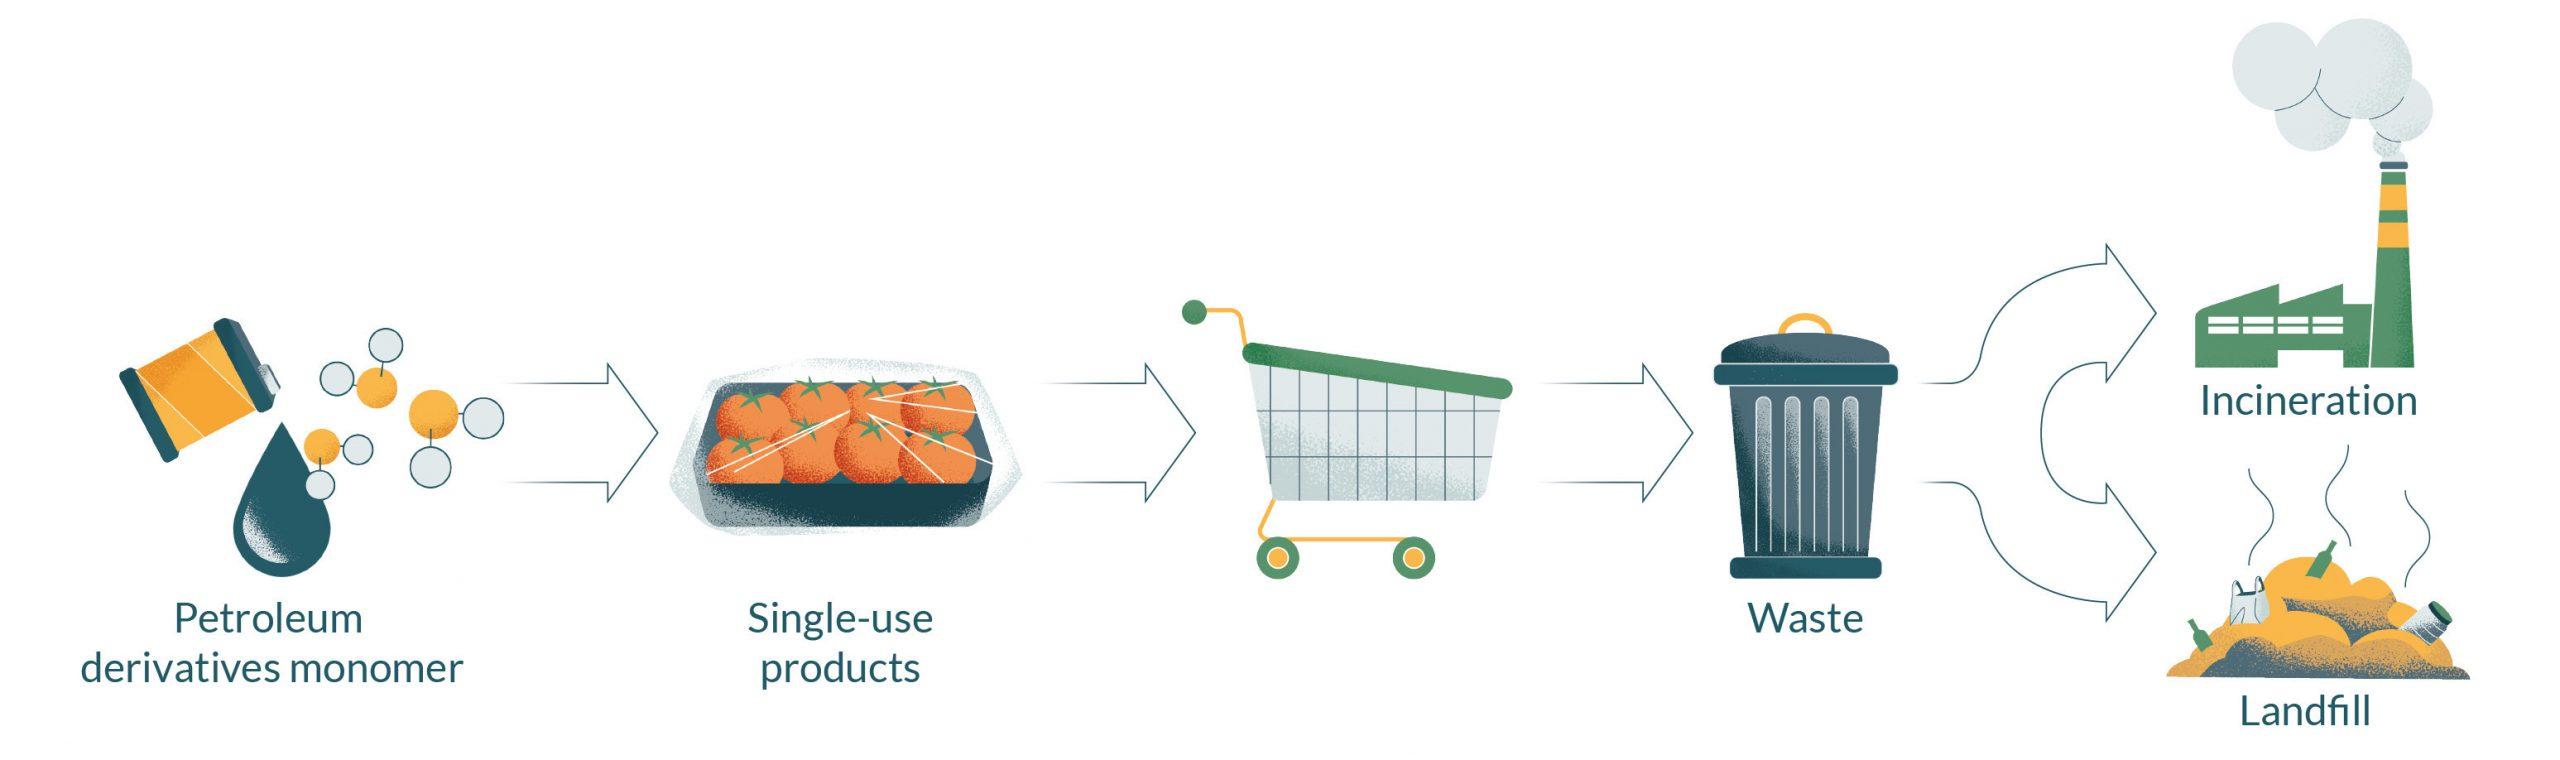 diagram about present plastic life